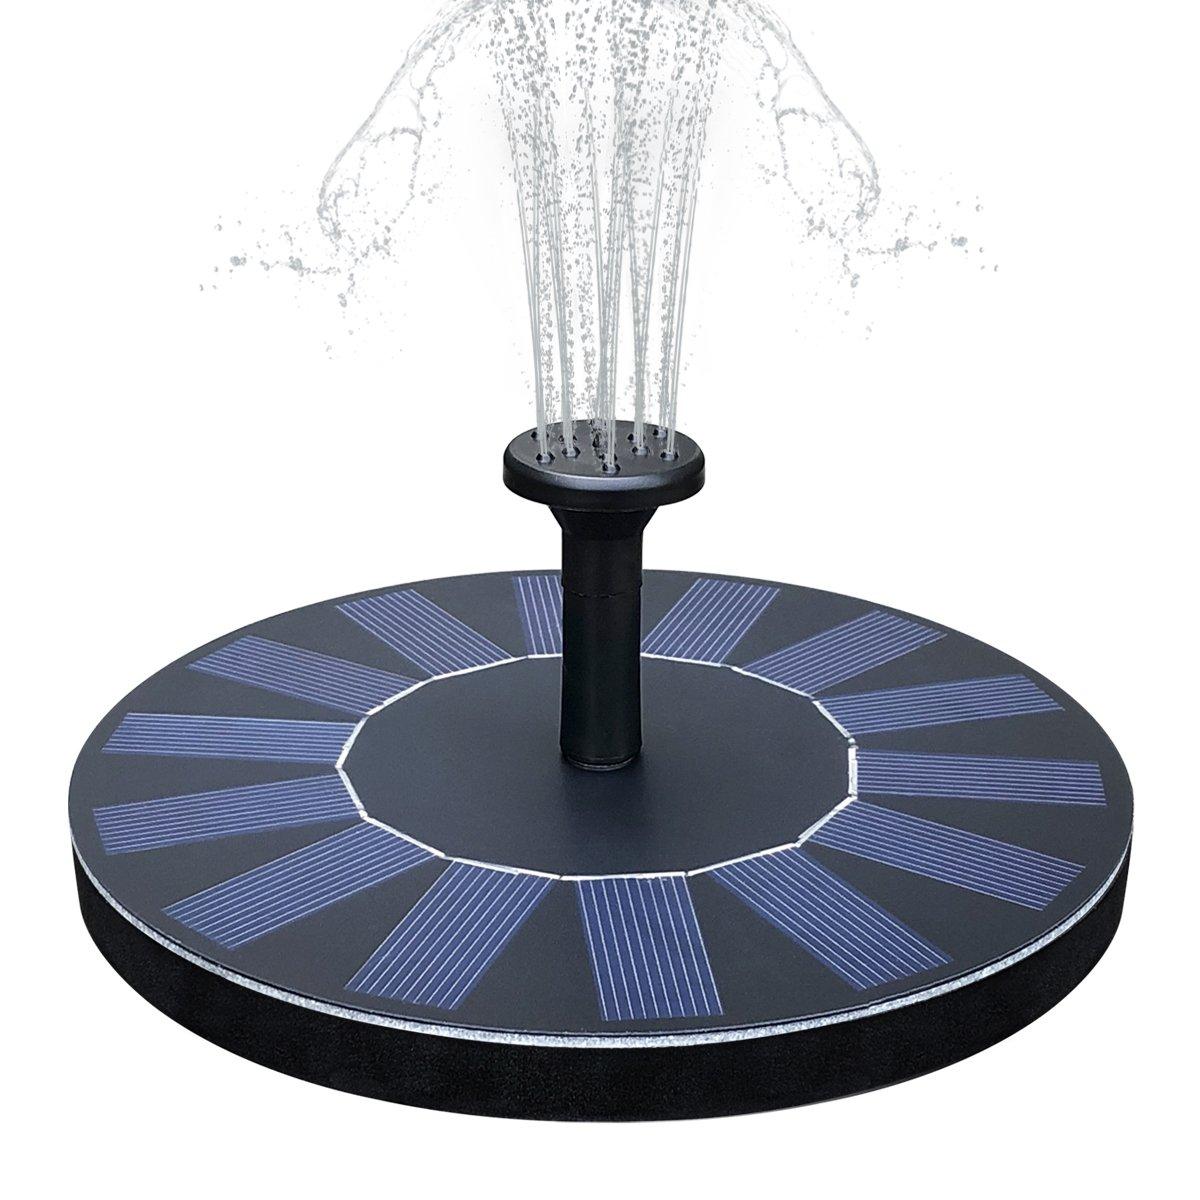 Feelle Solar Powered Bird Bath Fountain Pump 1.4W Solar Panel Fountain Kit, Outdoor Floating Submersible Water Fountain Pump for Pond, Pool, Garden, Fish Tank, Aquarium by Feelle